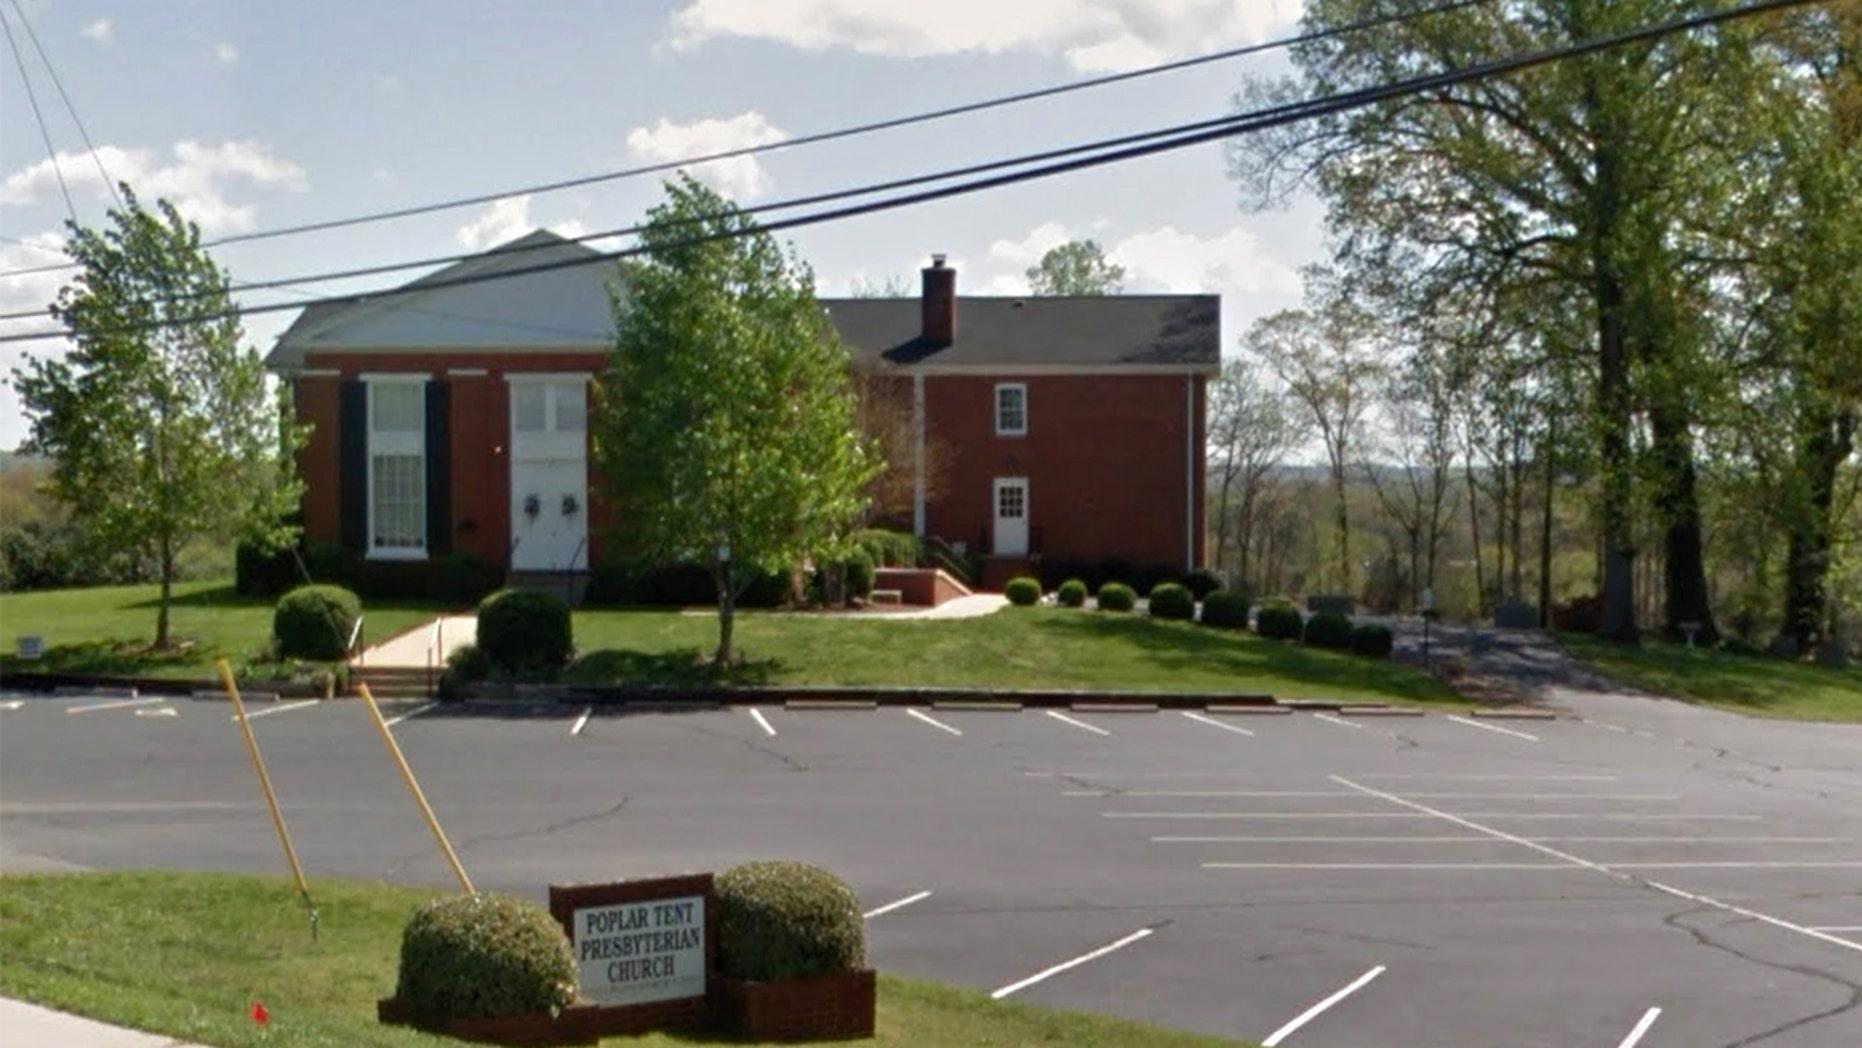 Poplar Tent Presbyterian Church in Kannapolis, North Carolina.